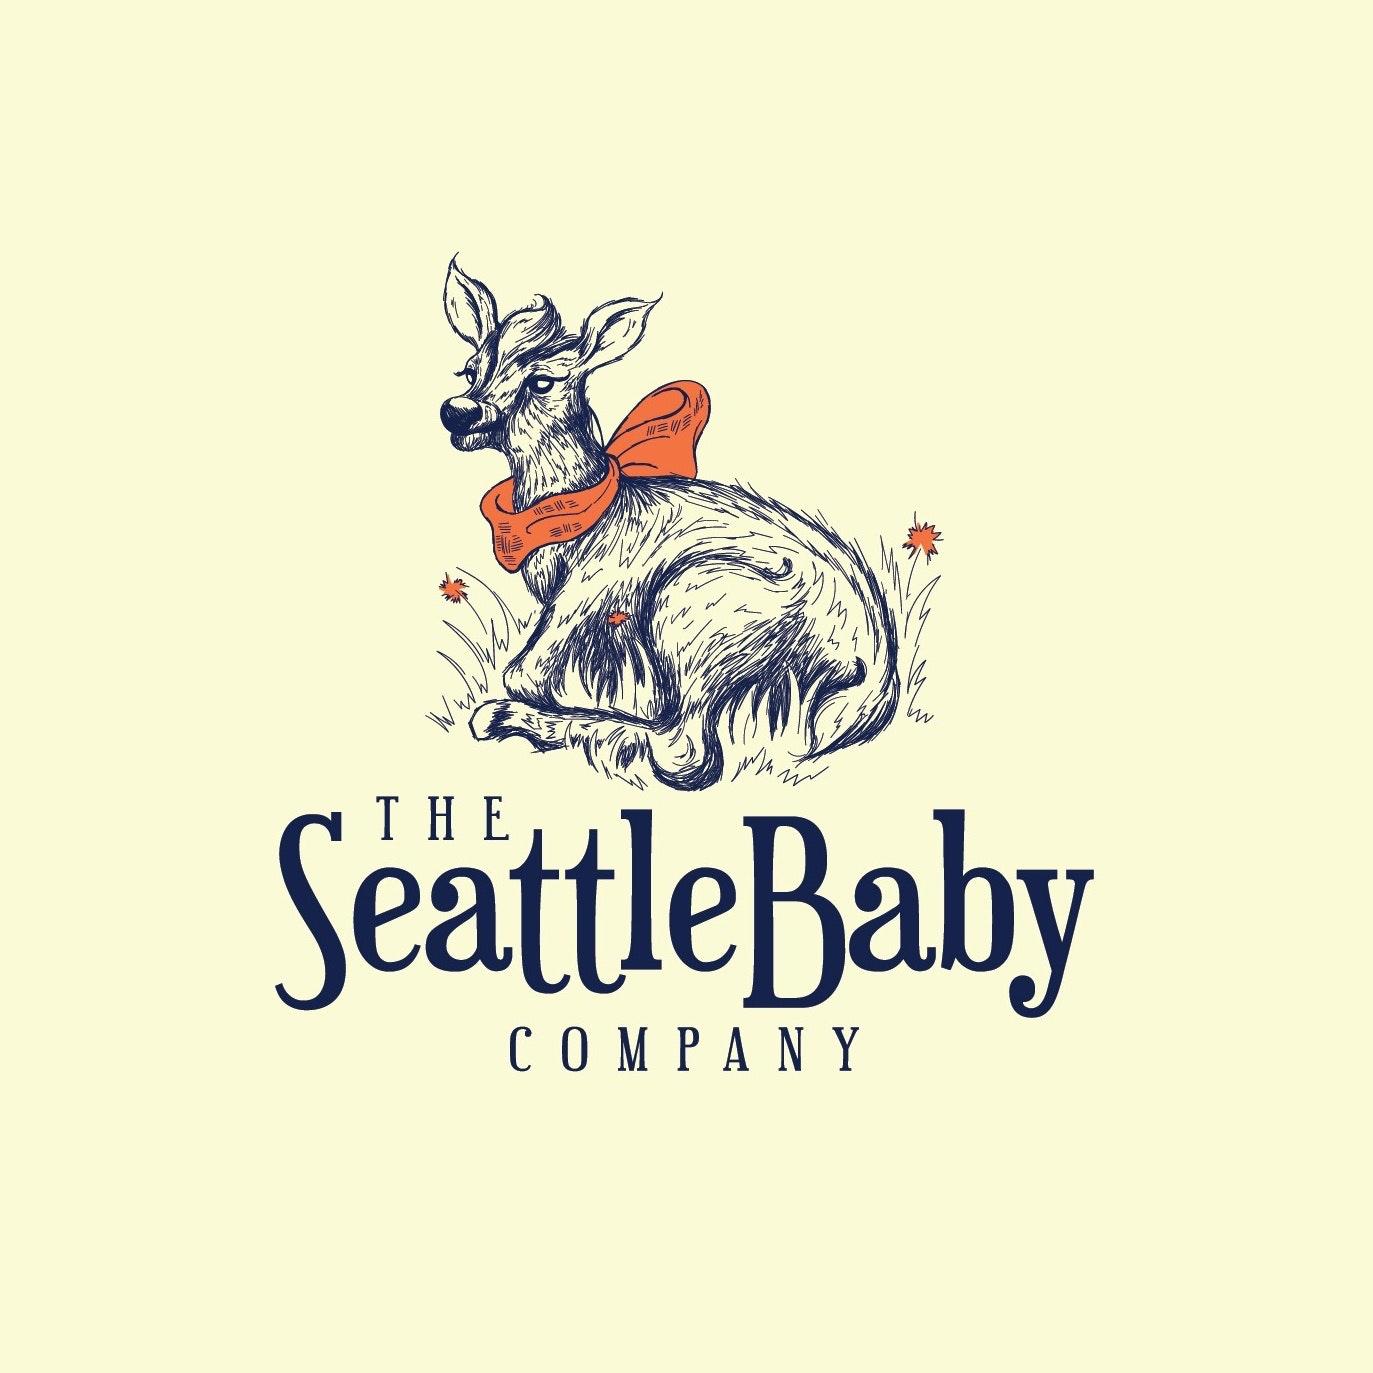 The Seattle Baby Company logo